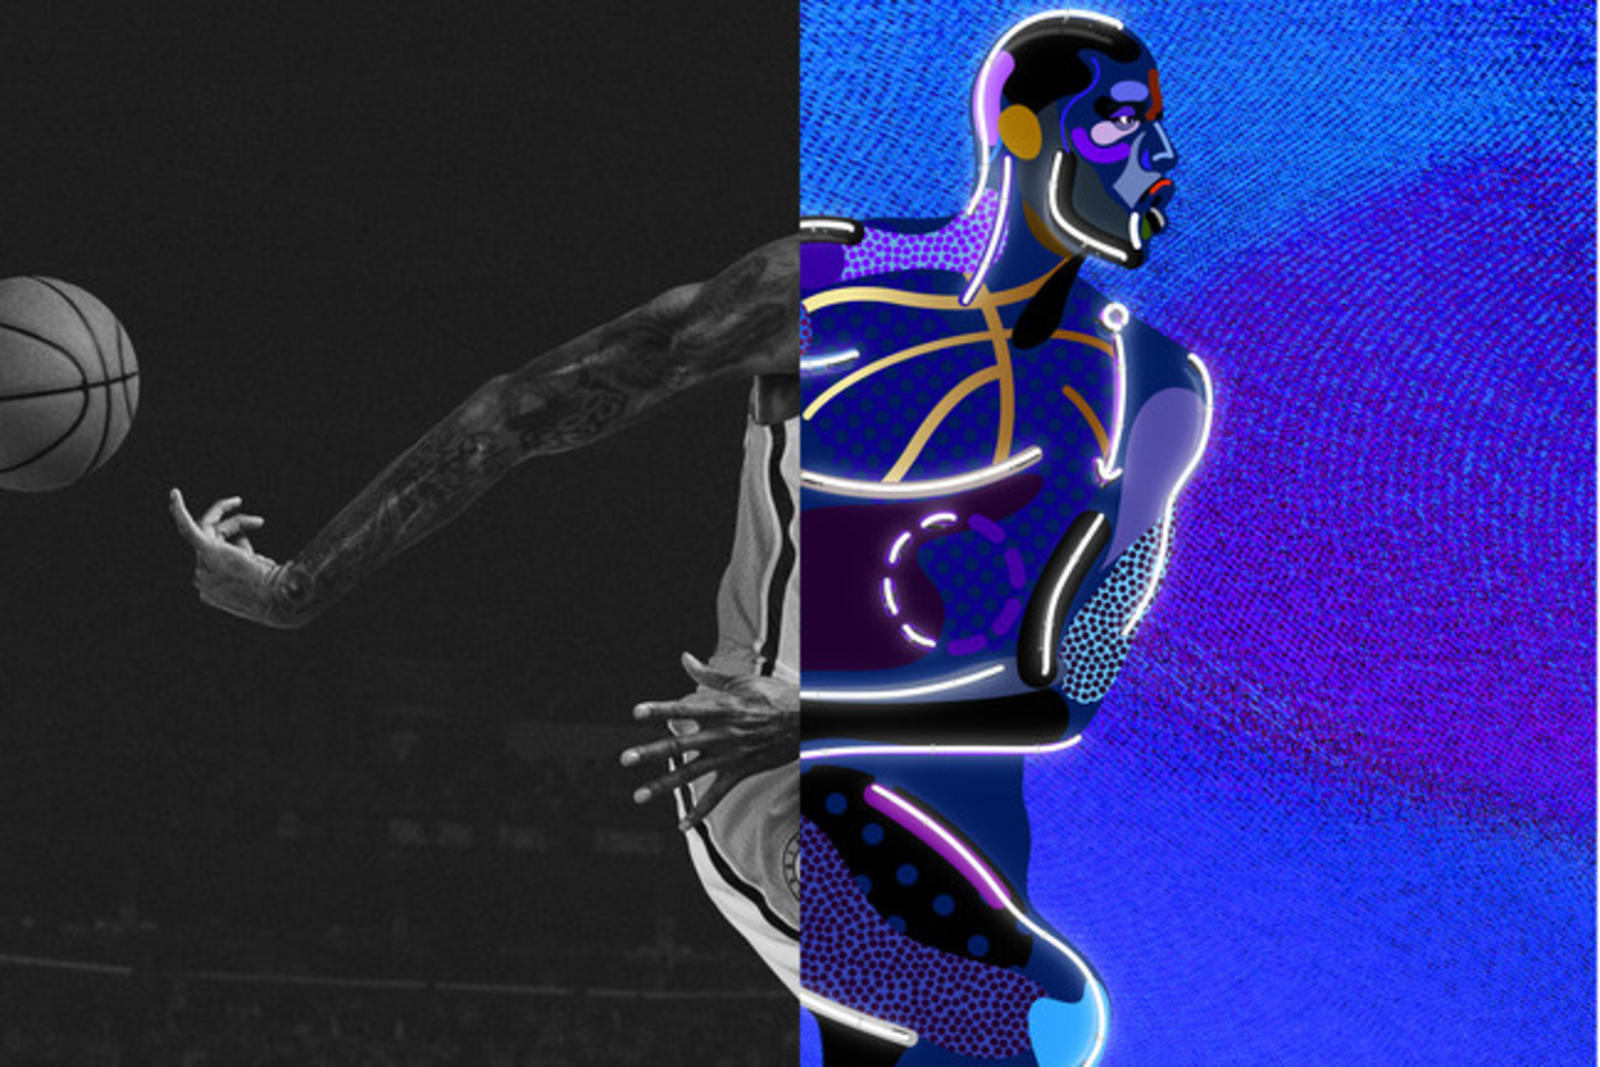 Nike Basketball Hd Wallpaper Nike Basketball Flip The Switch Collection Nike News